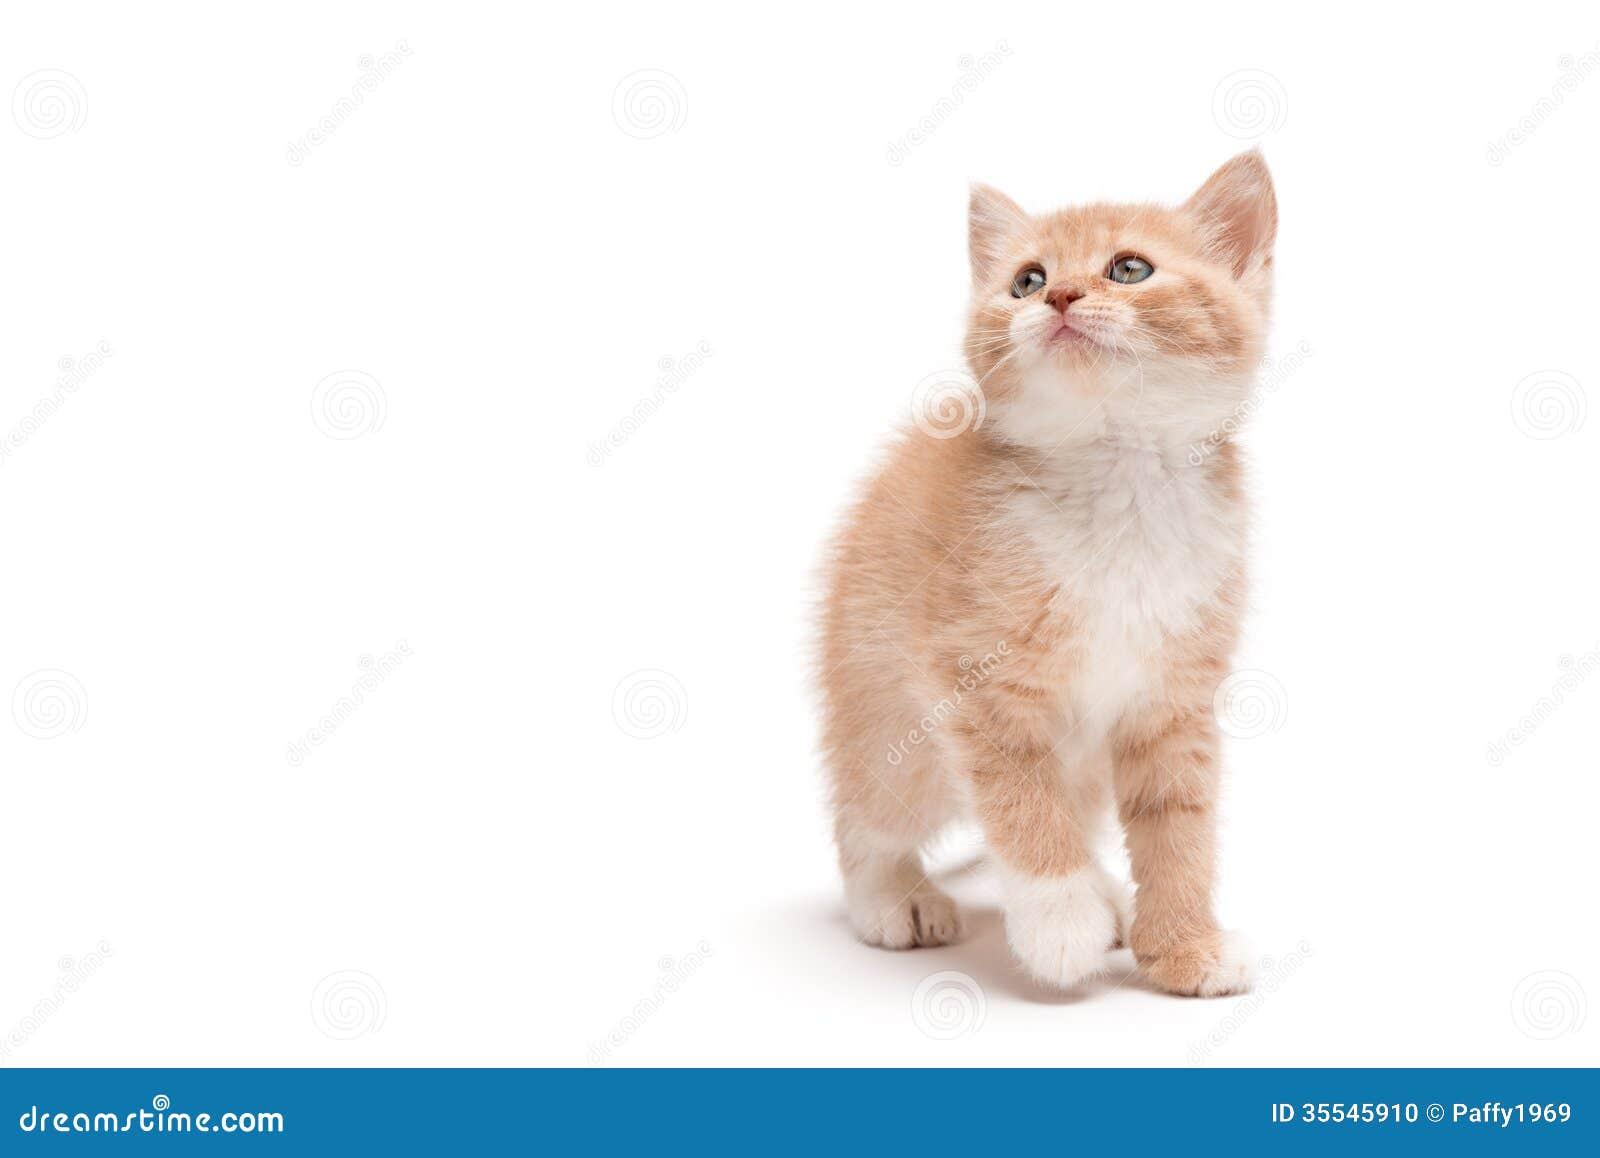 Kitten walking in studio looking up